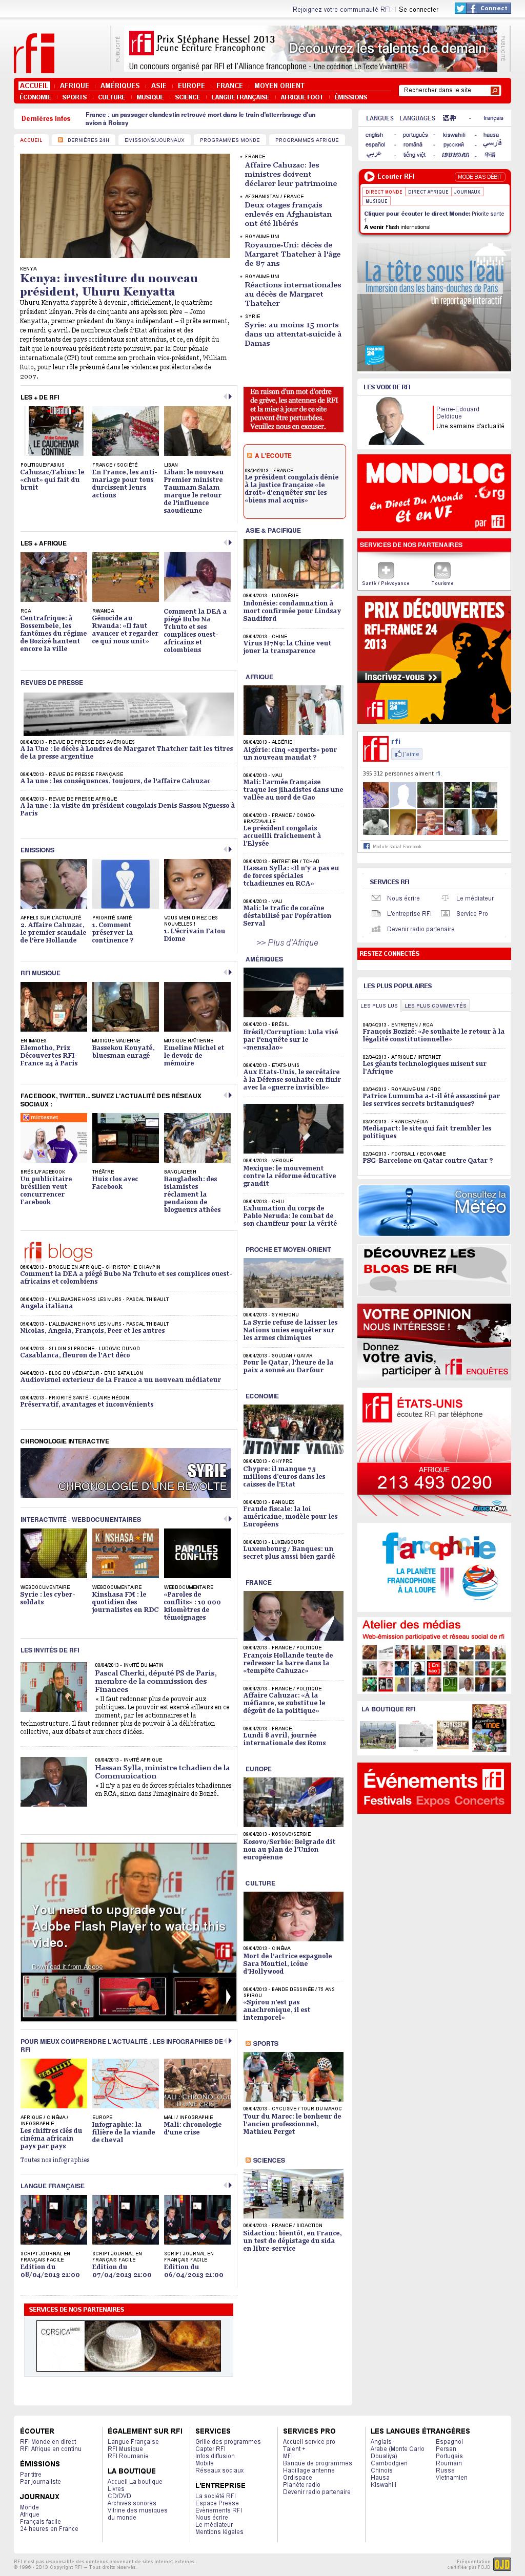 RFI at Tuesday April 9, 2013, 2:19 a.m. UTC